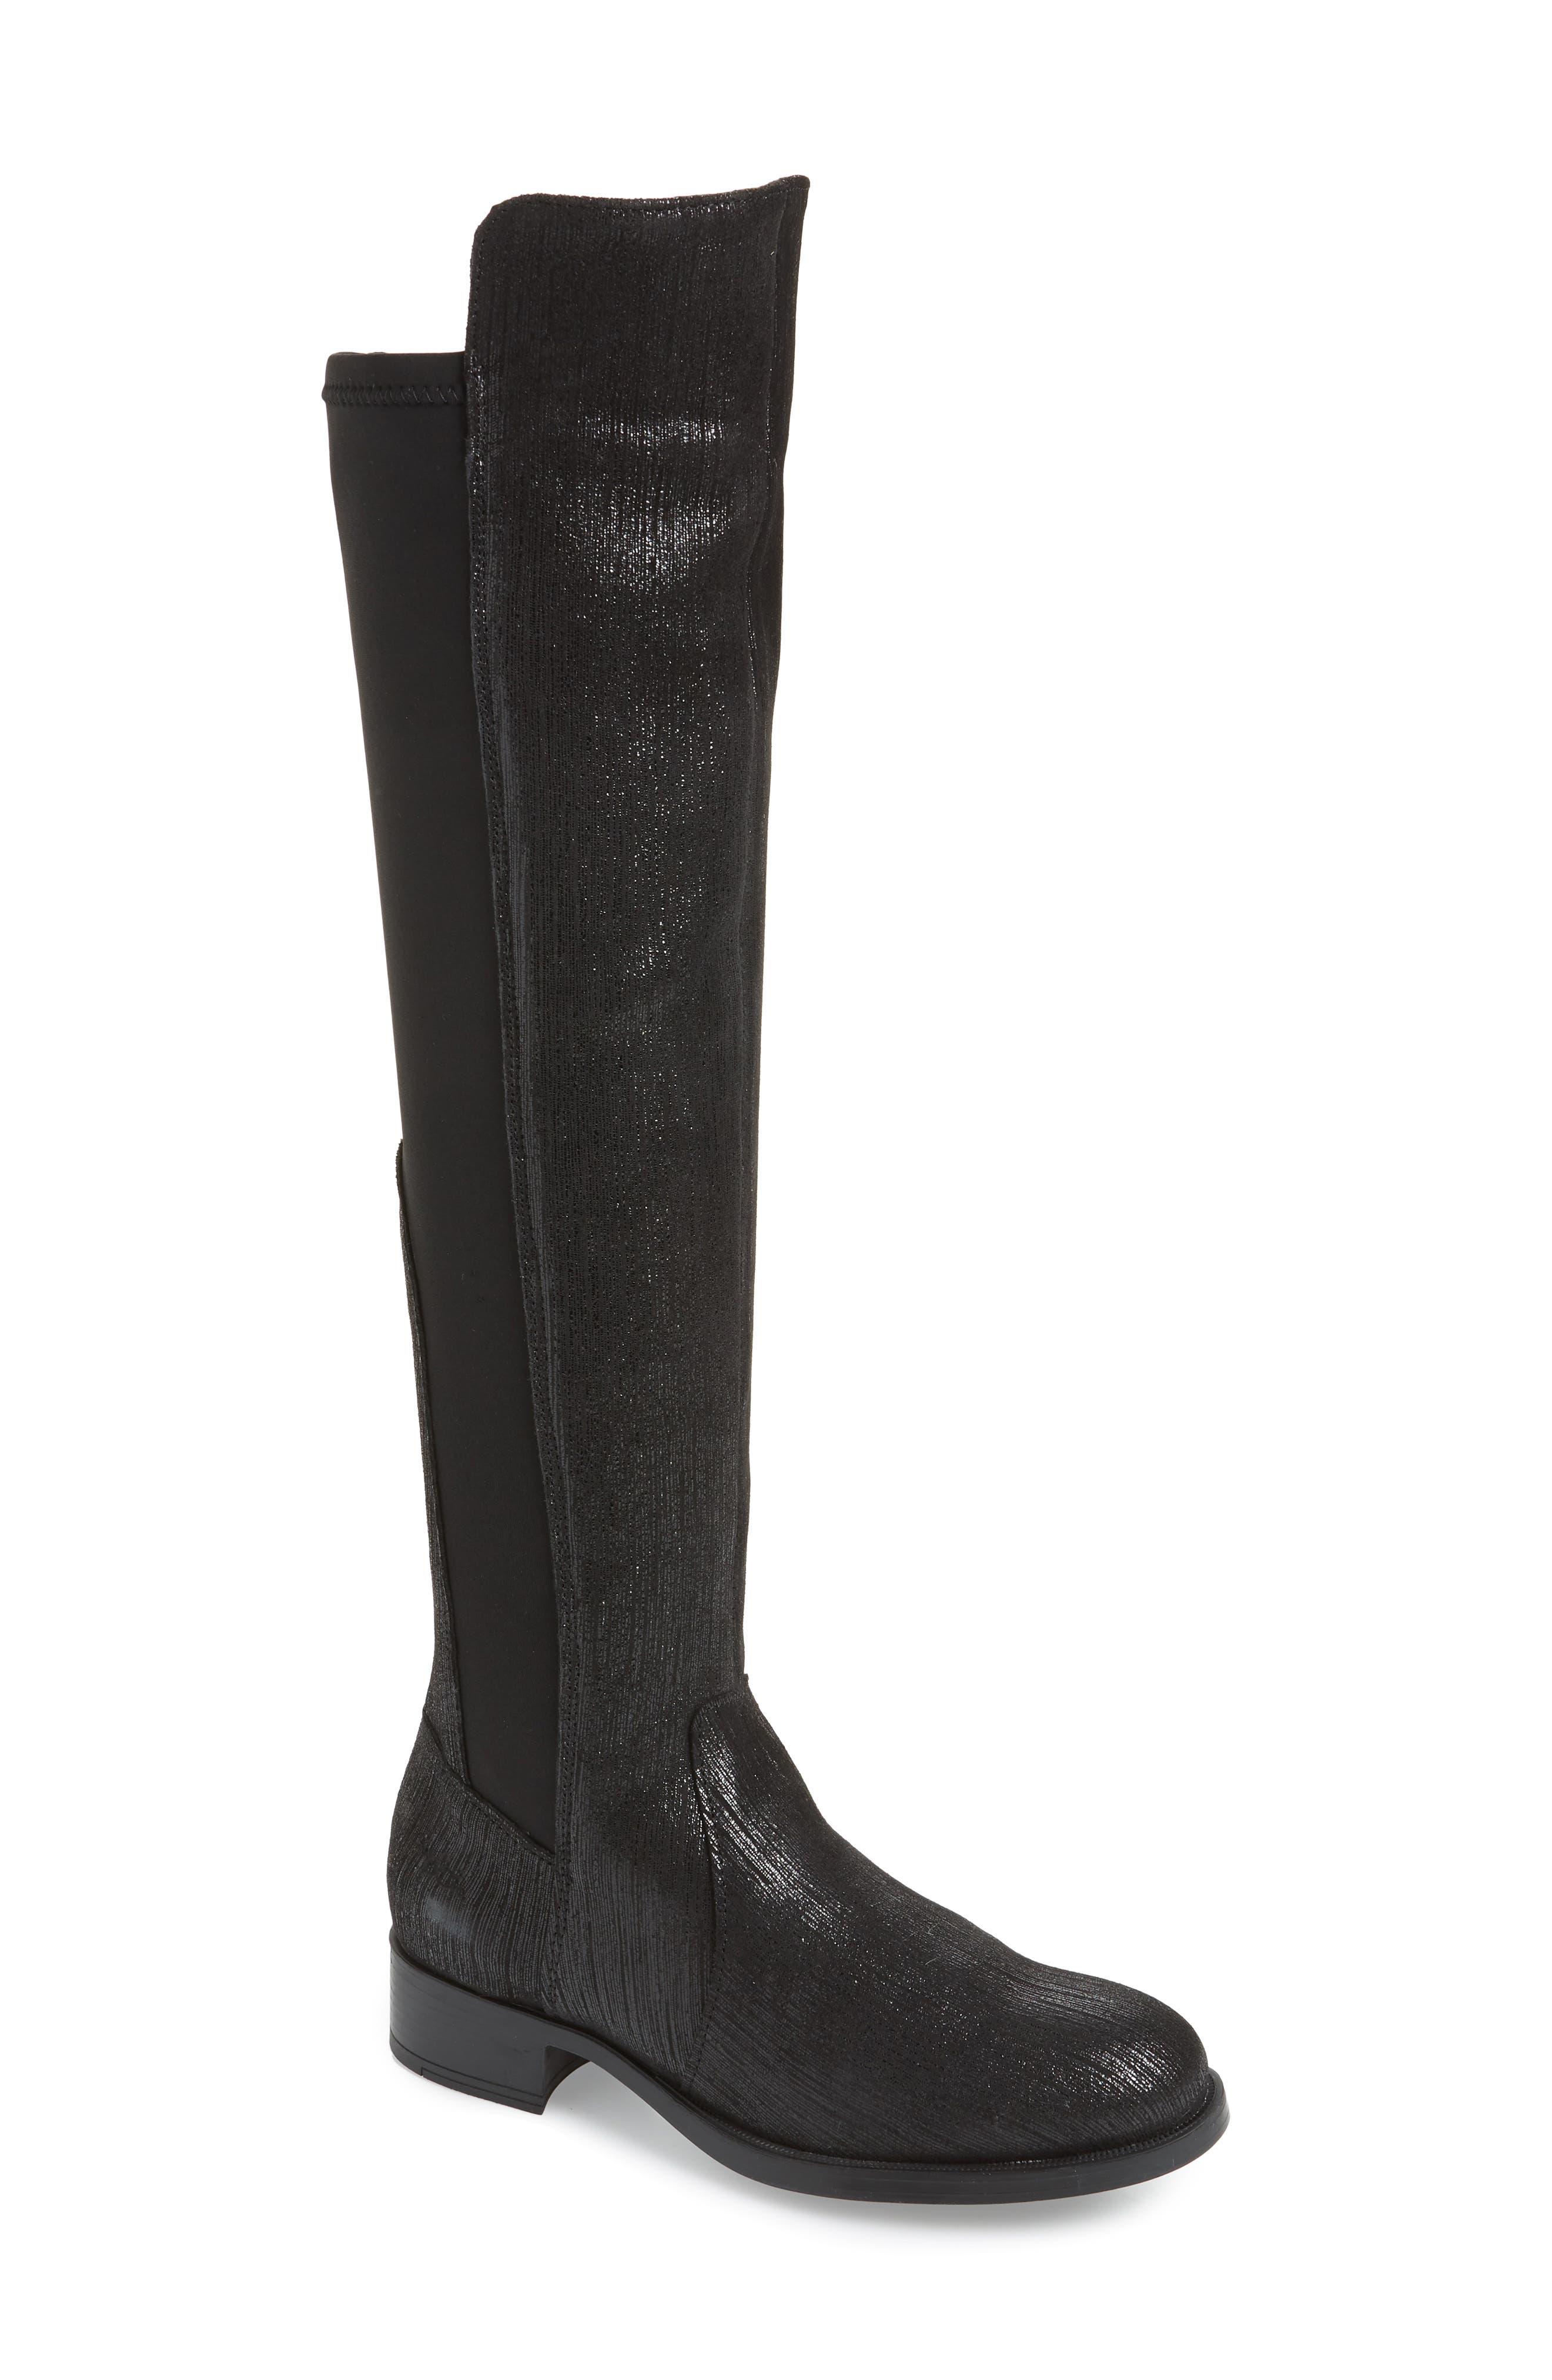 BOS. & CO., Bunt Waterproof Over the Knee Boot, Main thumbnail 1, color, BLACK METAL/ LYCRA